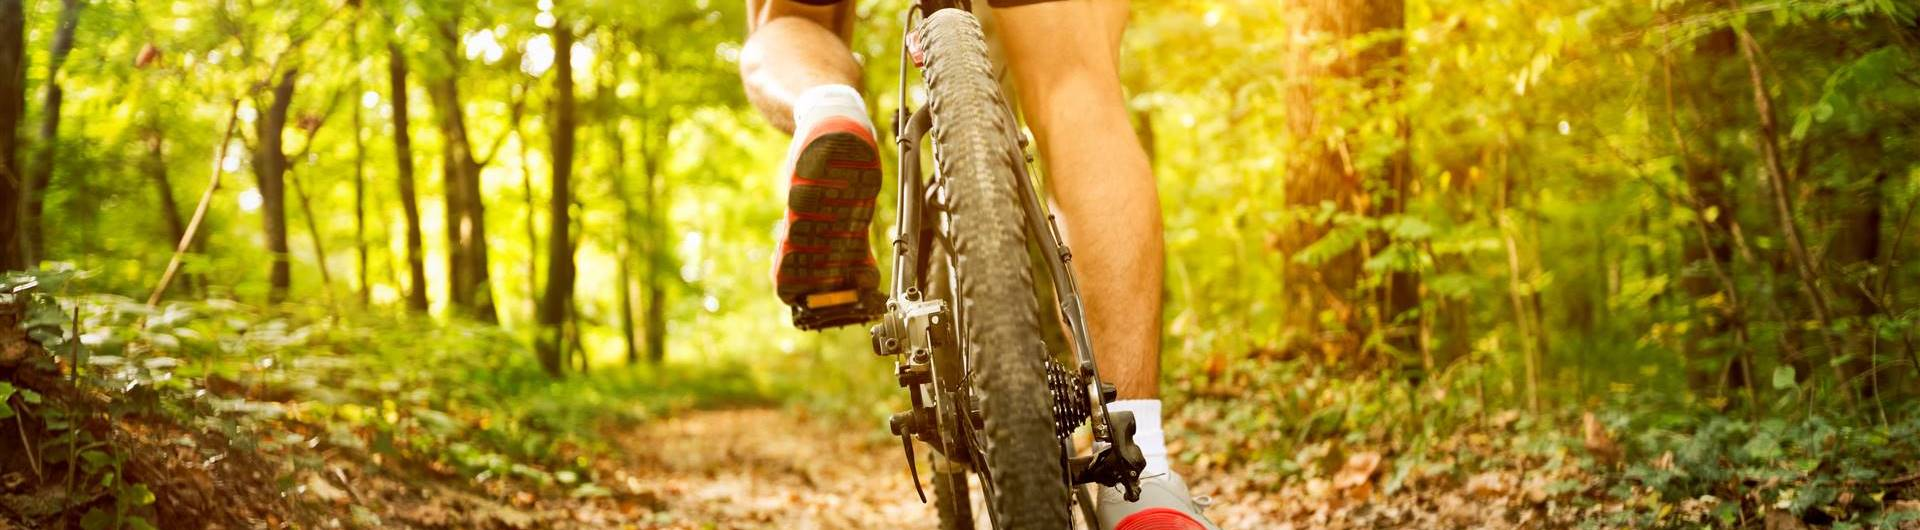 Cycling & mountain biking   Thermen & Sporthotel Gutenbrunn